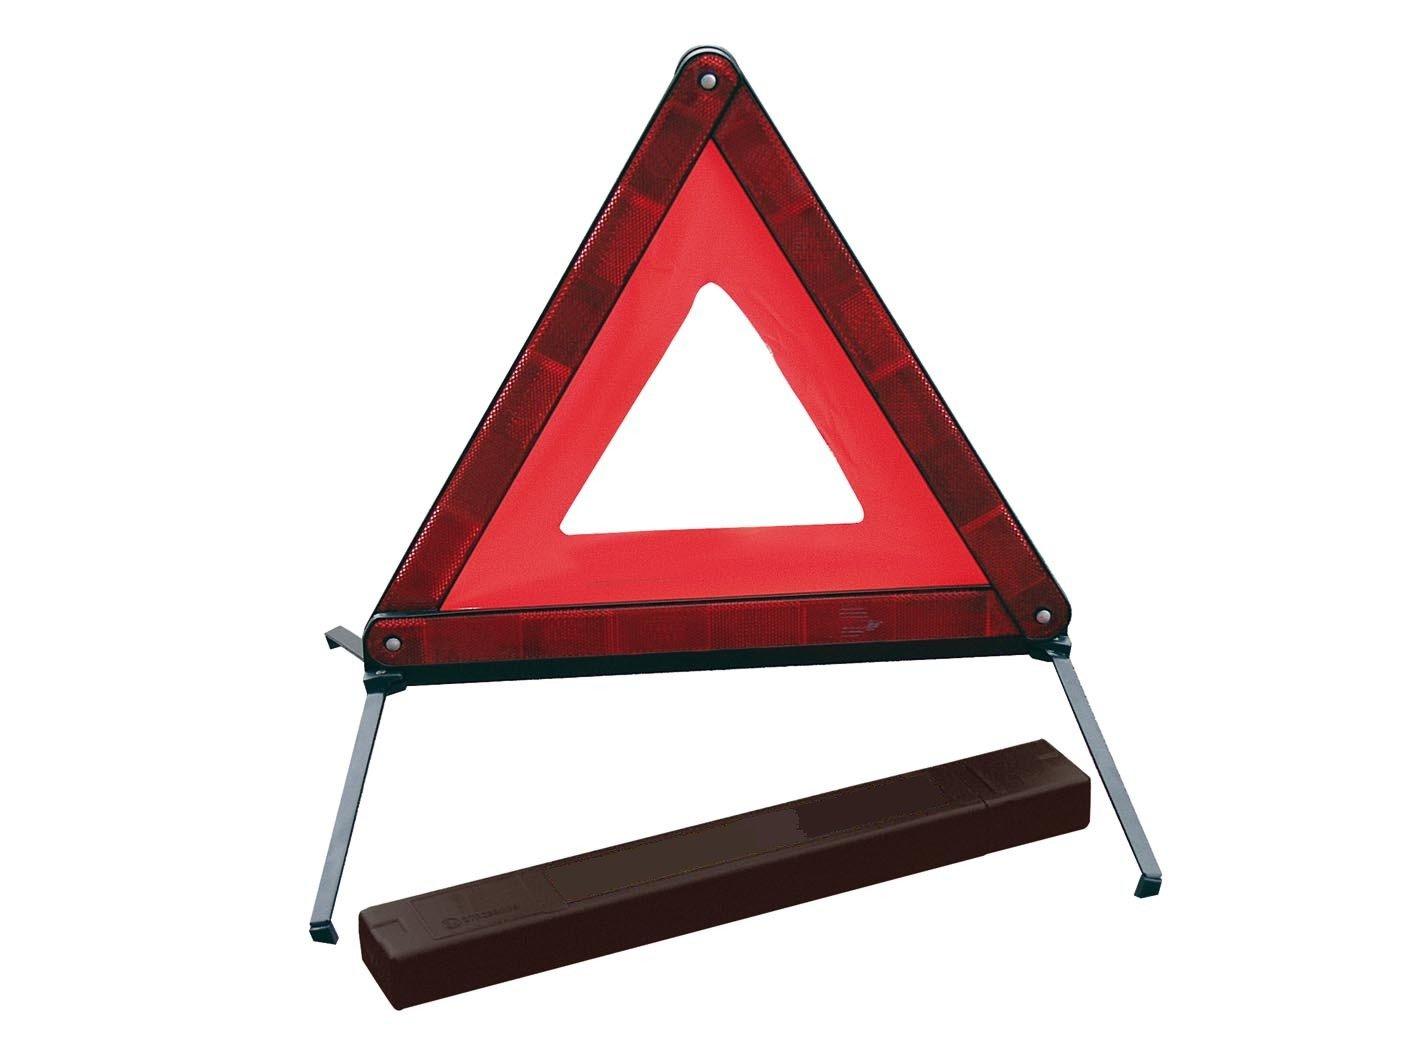 HP 10132 - Triangolo segnaletico HP-Autozubehör